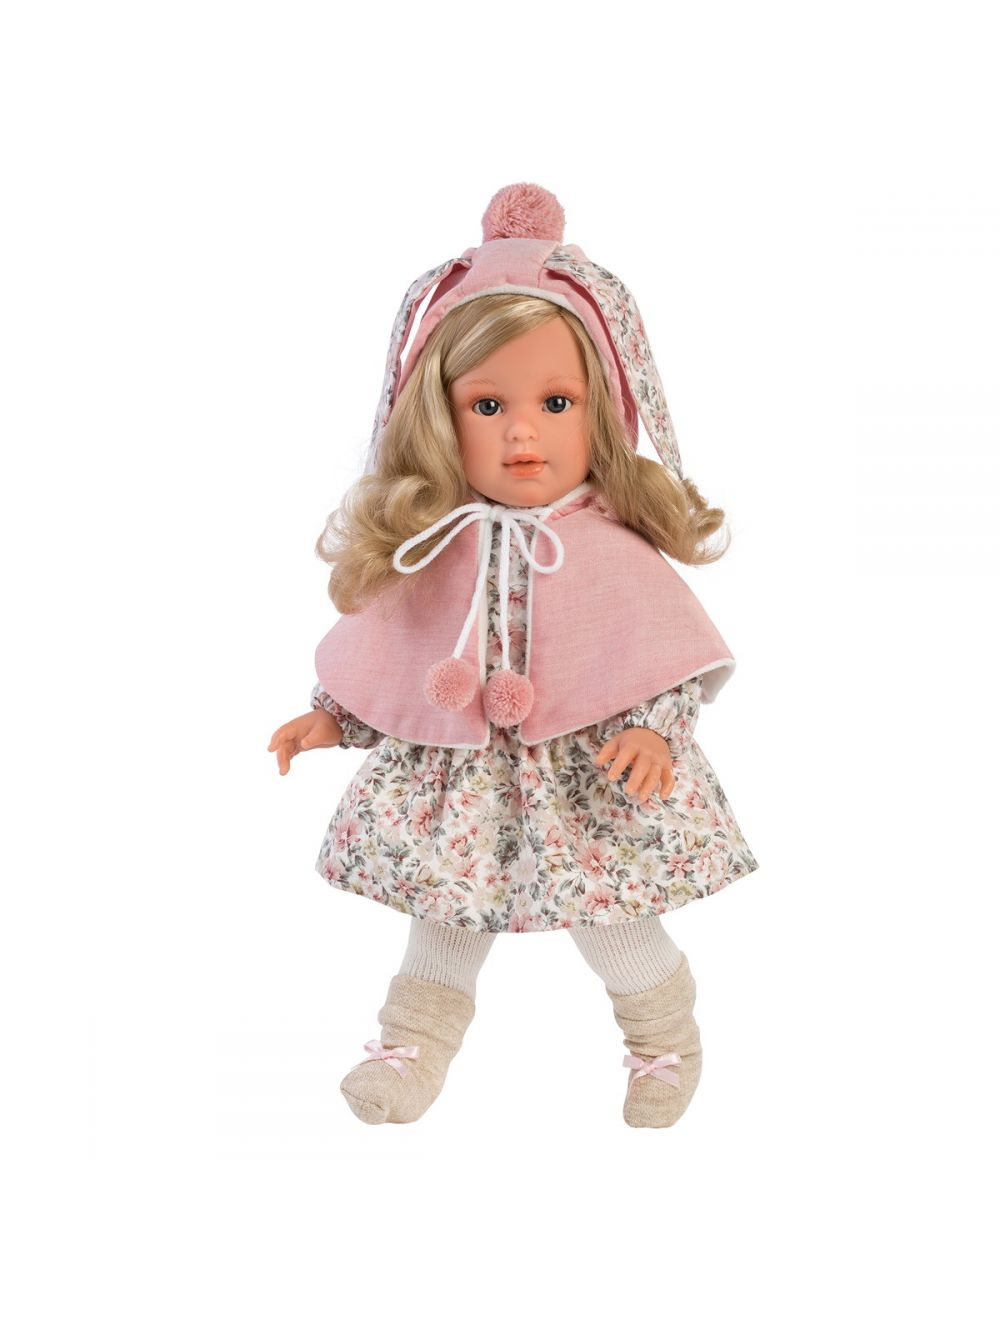 Llorens 54024 Lalka Lucia 40 cm blondynka różowy kaptur